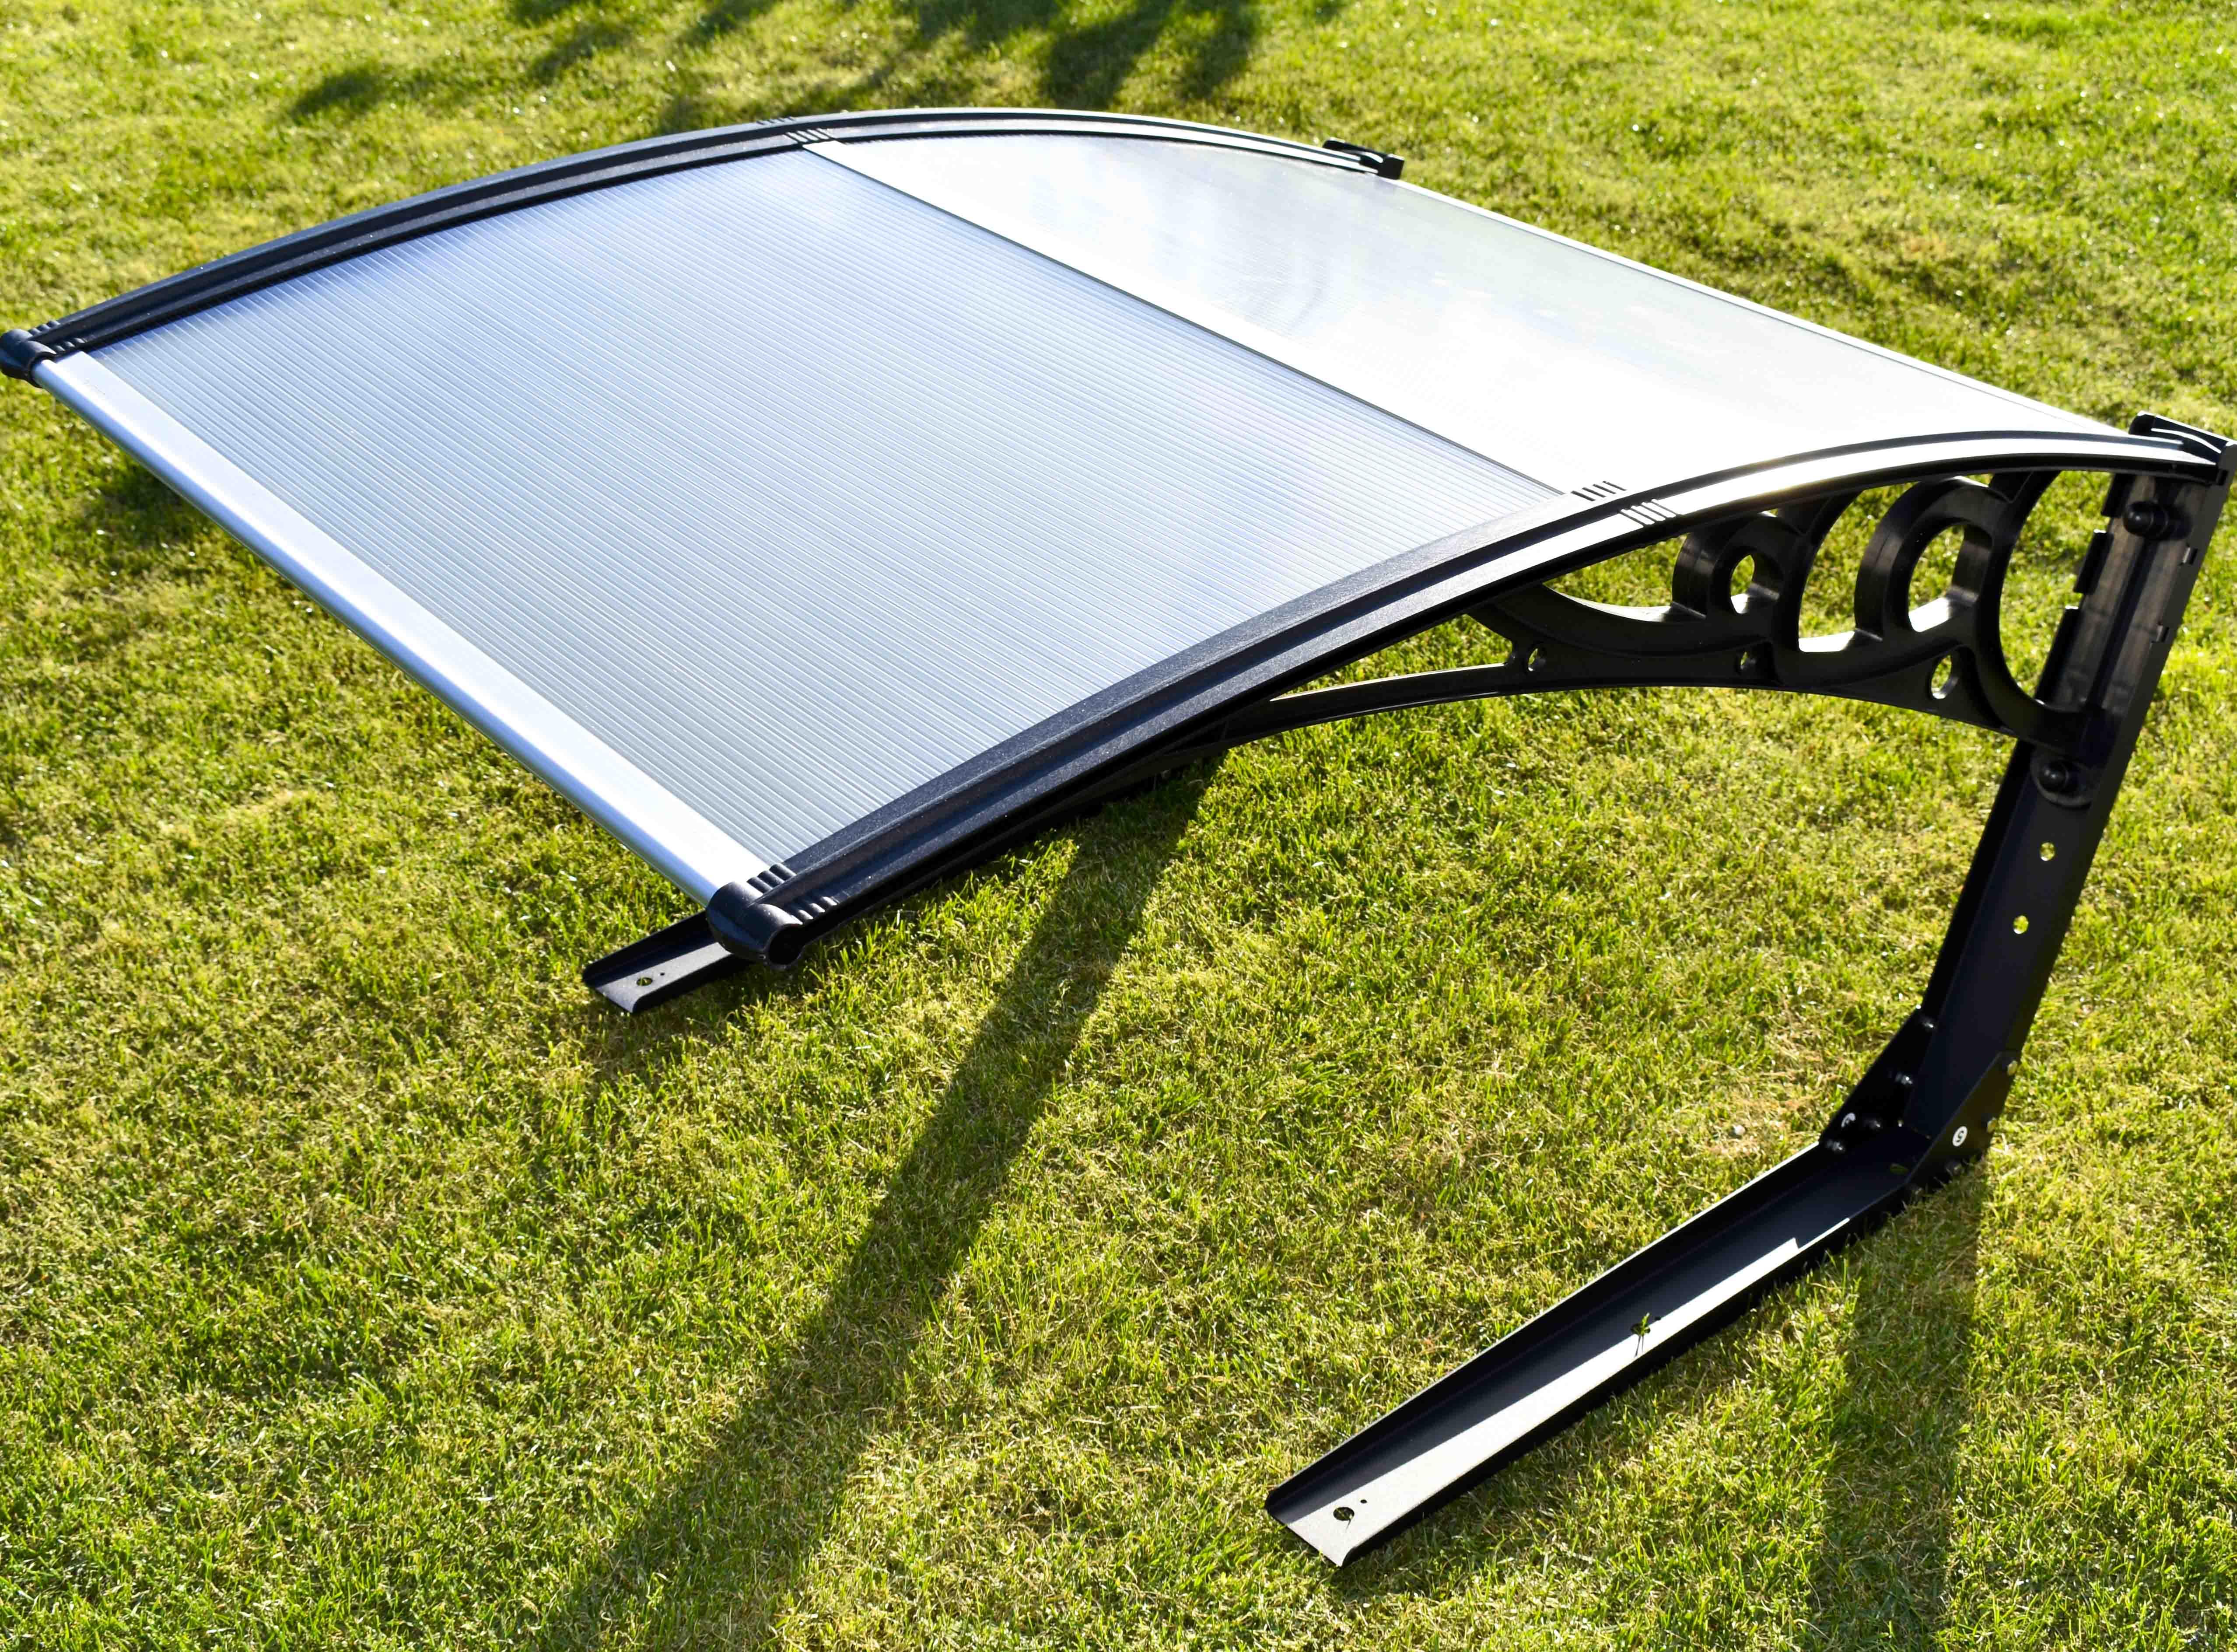 shs m hroboter garage dach carport berdachung f r. Black Bedroom Furniture Sets. Home Design Ideas